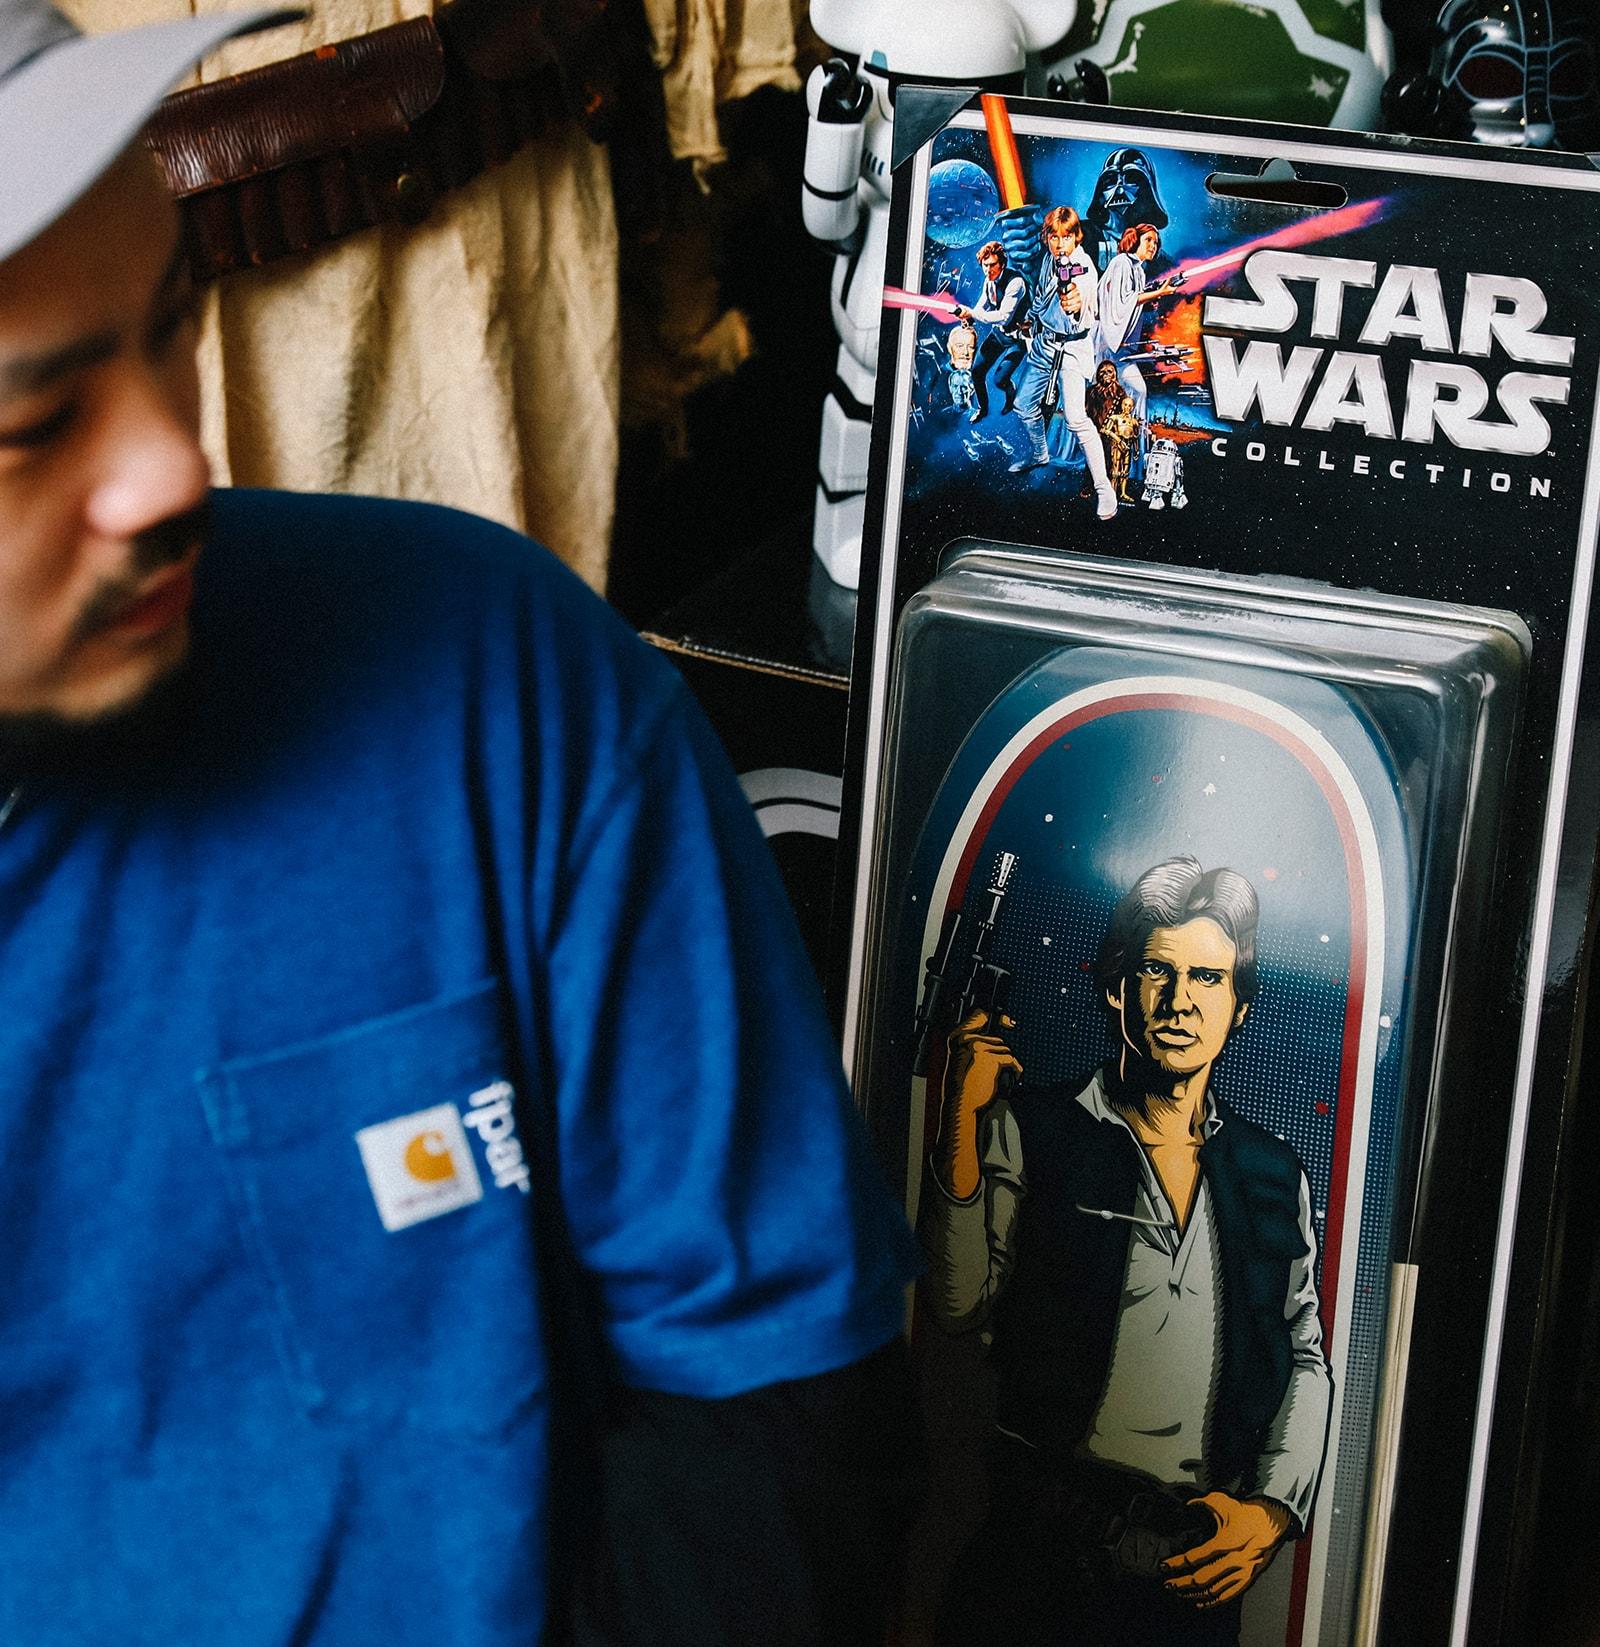 收藏公開!《Star Wars》愛好者談論原力的浪漫|BUYER'S GUIDE